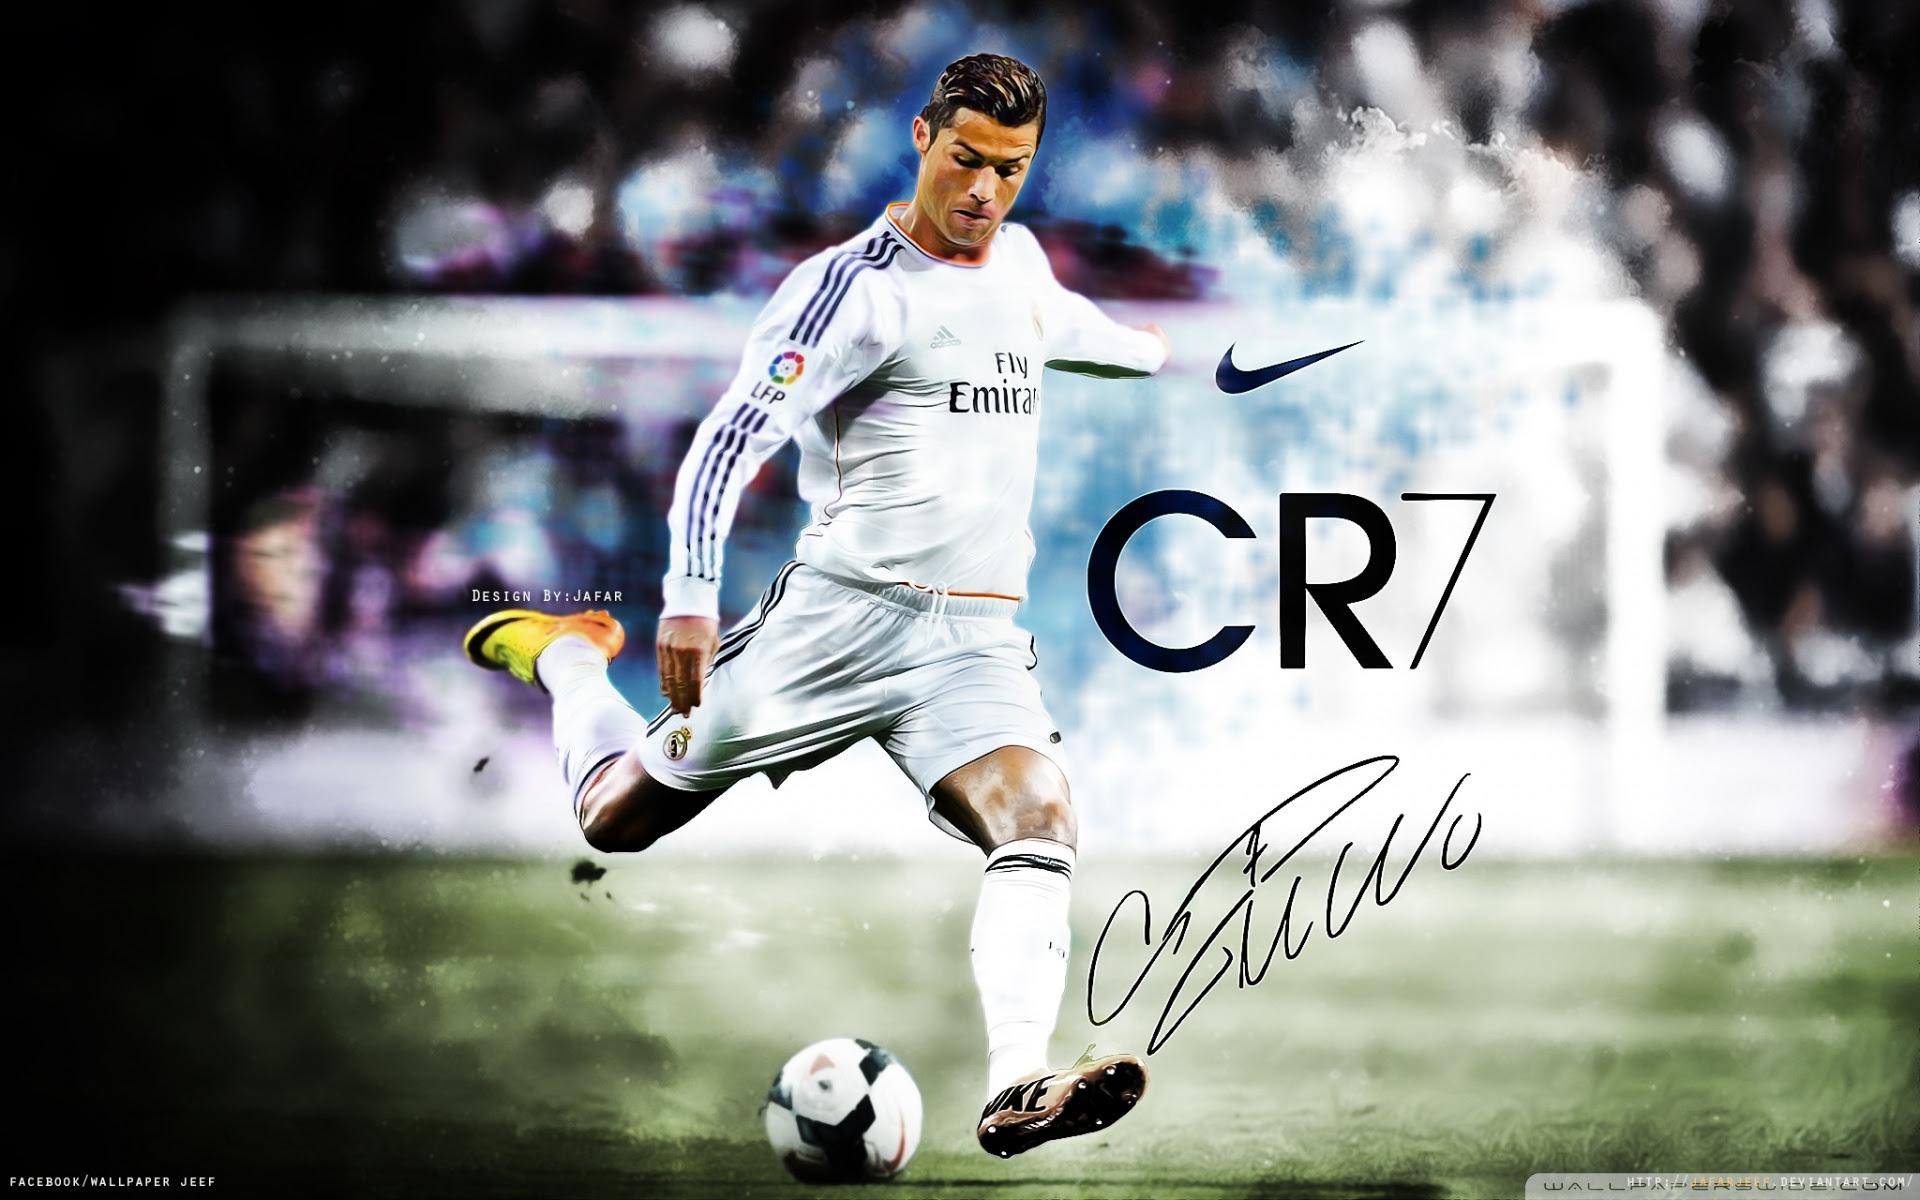 Cristiano Ronaldo Real Madrid Wallpaper 1920x1200 19103